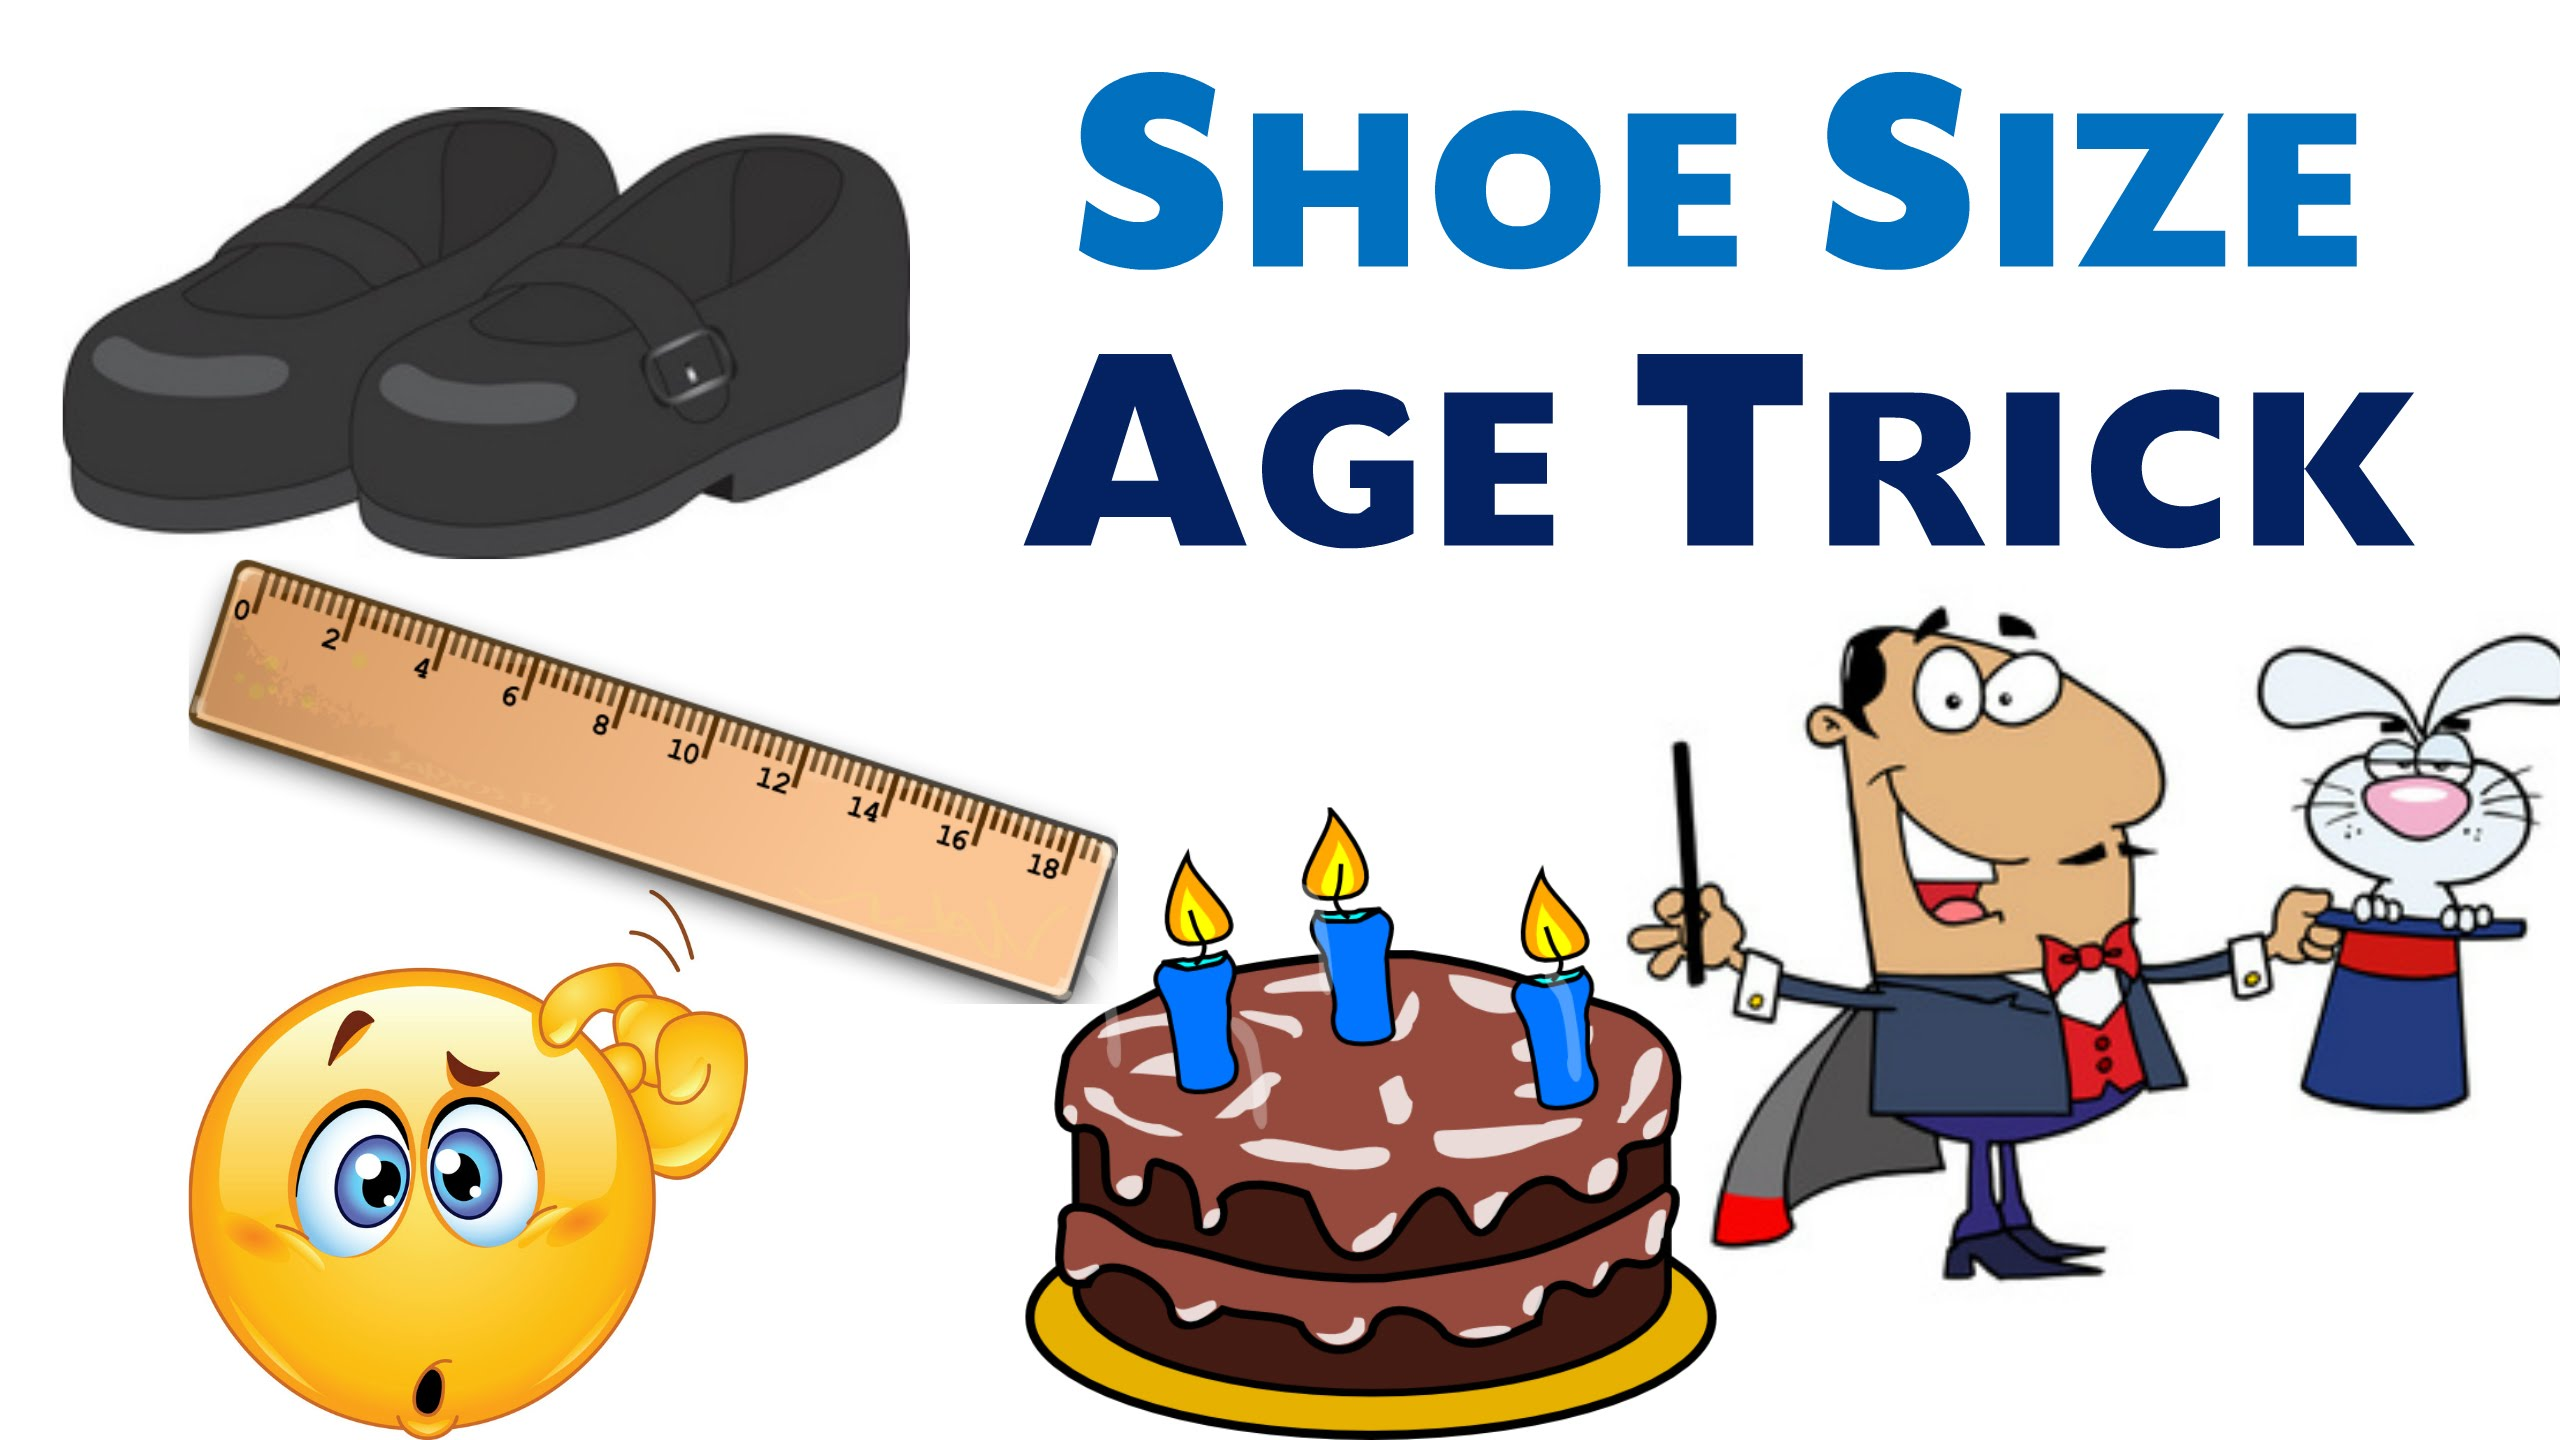 Shoe Size age trick.